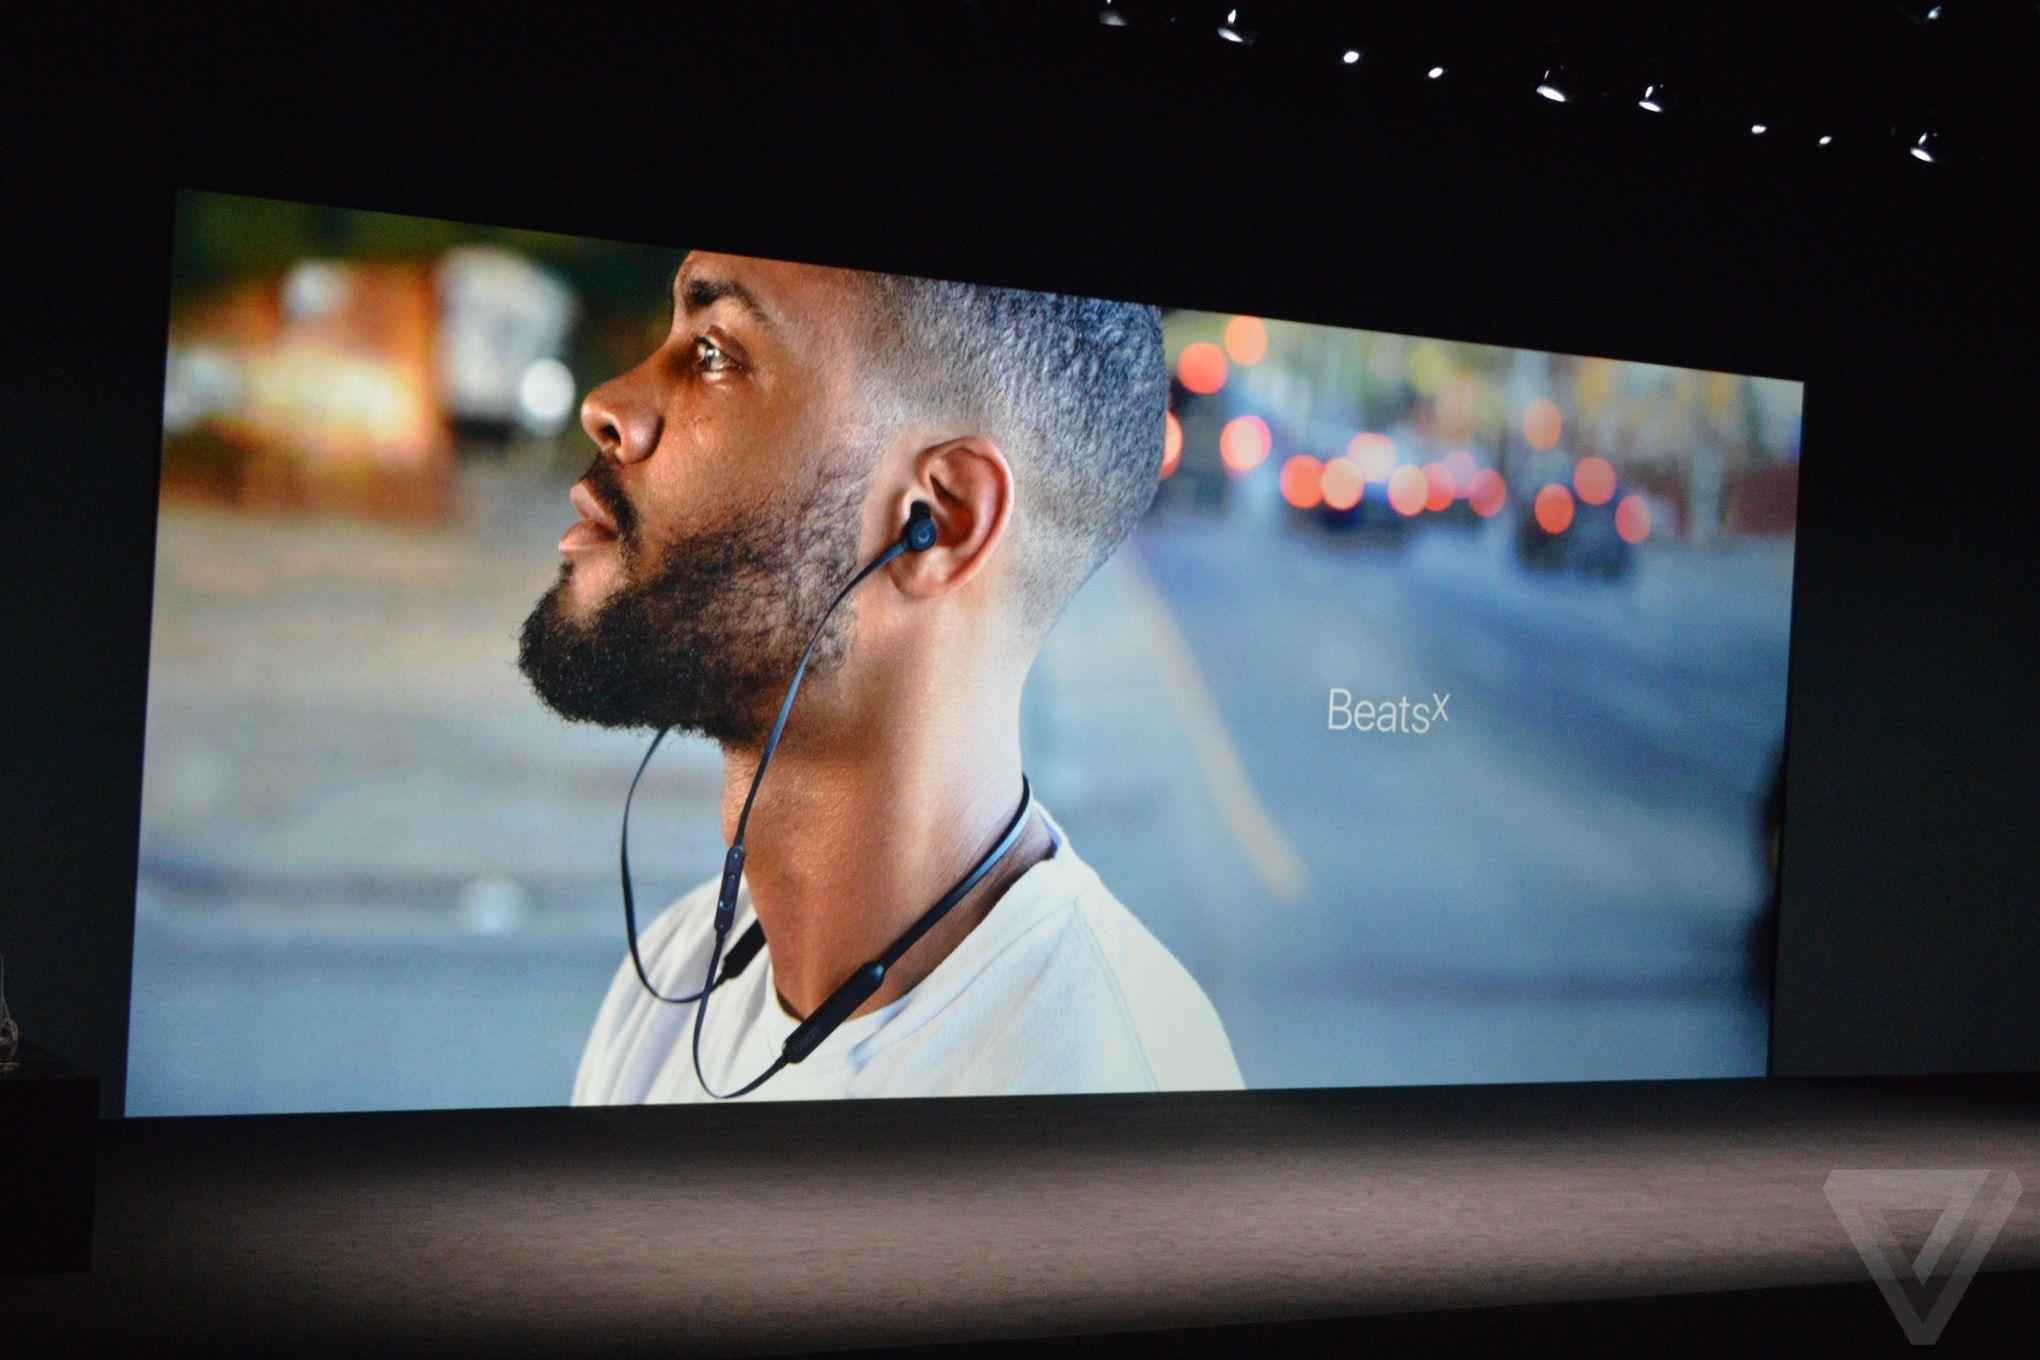 cef0e0d8446 Beats unveils new wireless headphones because Apple killed the headphone  jack